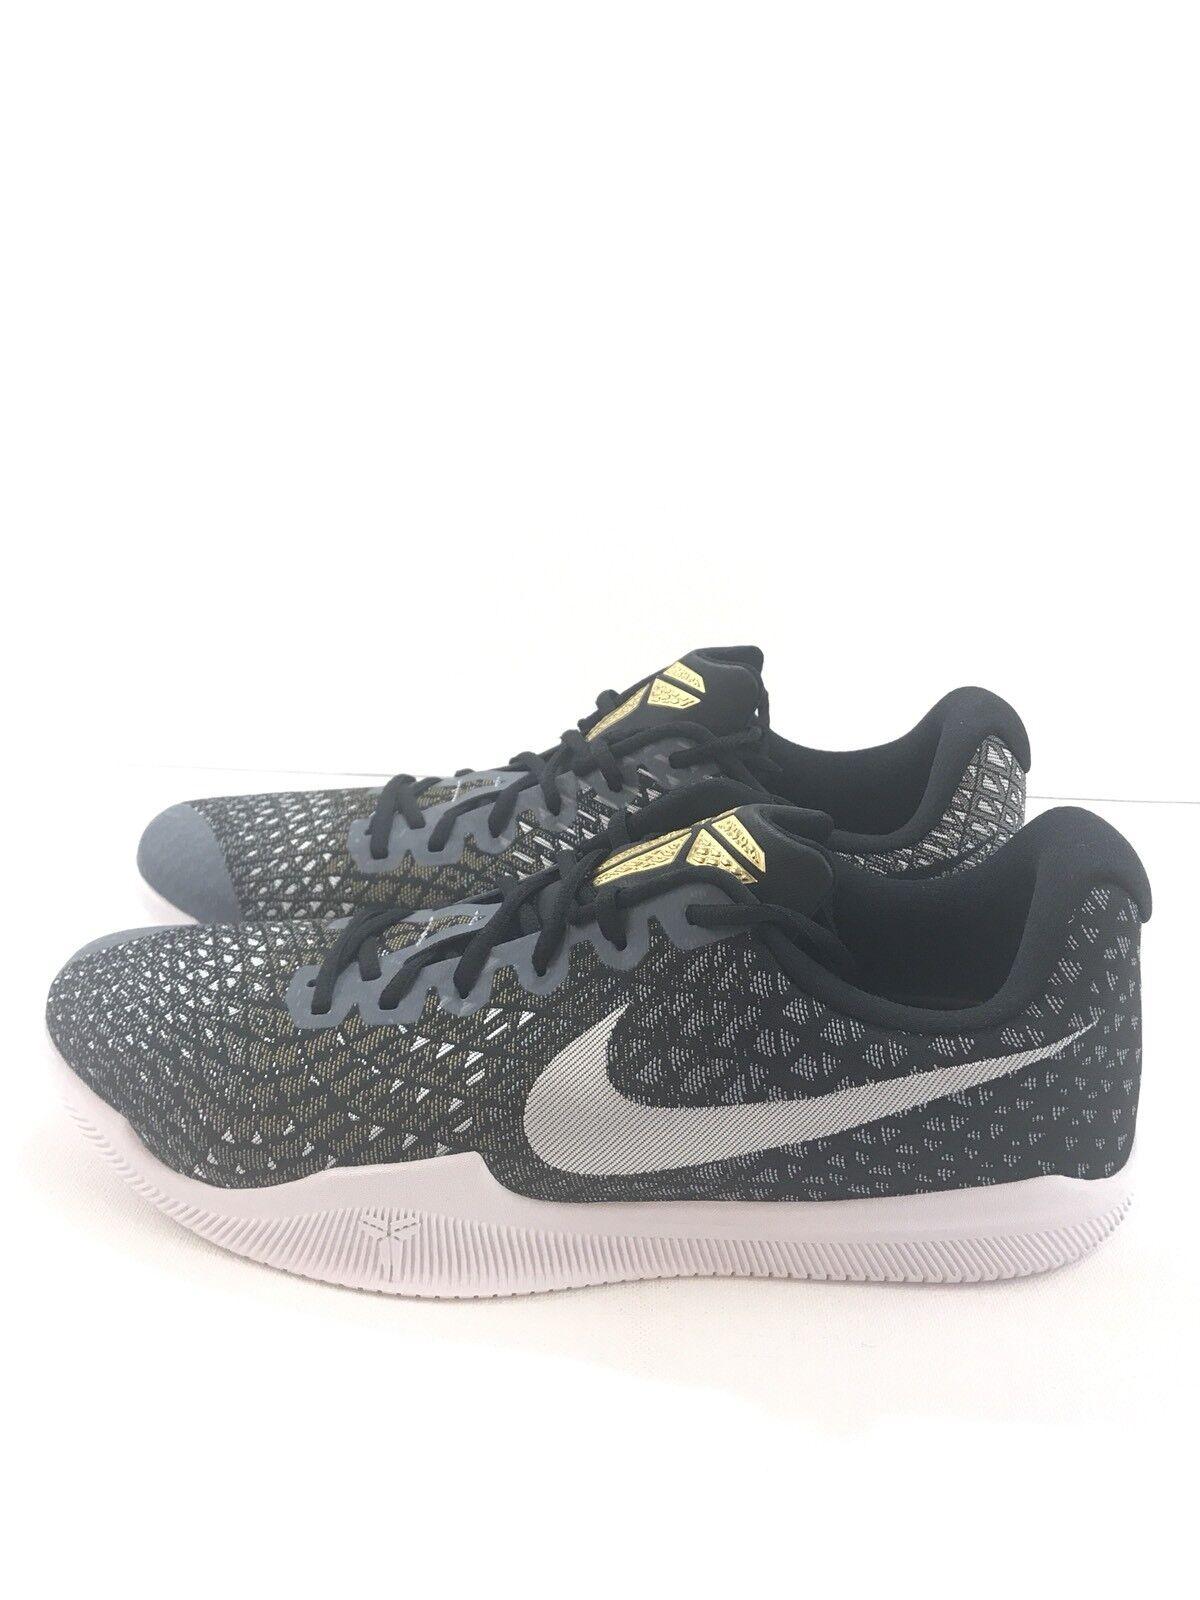 c400dd2ee7d497 Nike Mens Kobe Mamba Instinct Shoes Black Black Black White Grey Gold  852473-010 Size